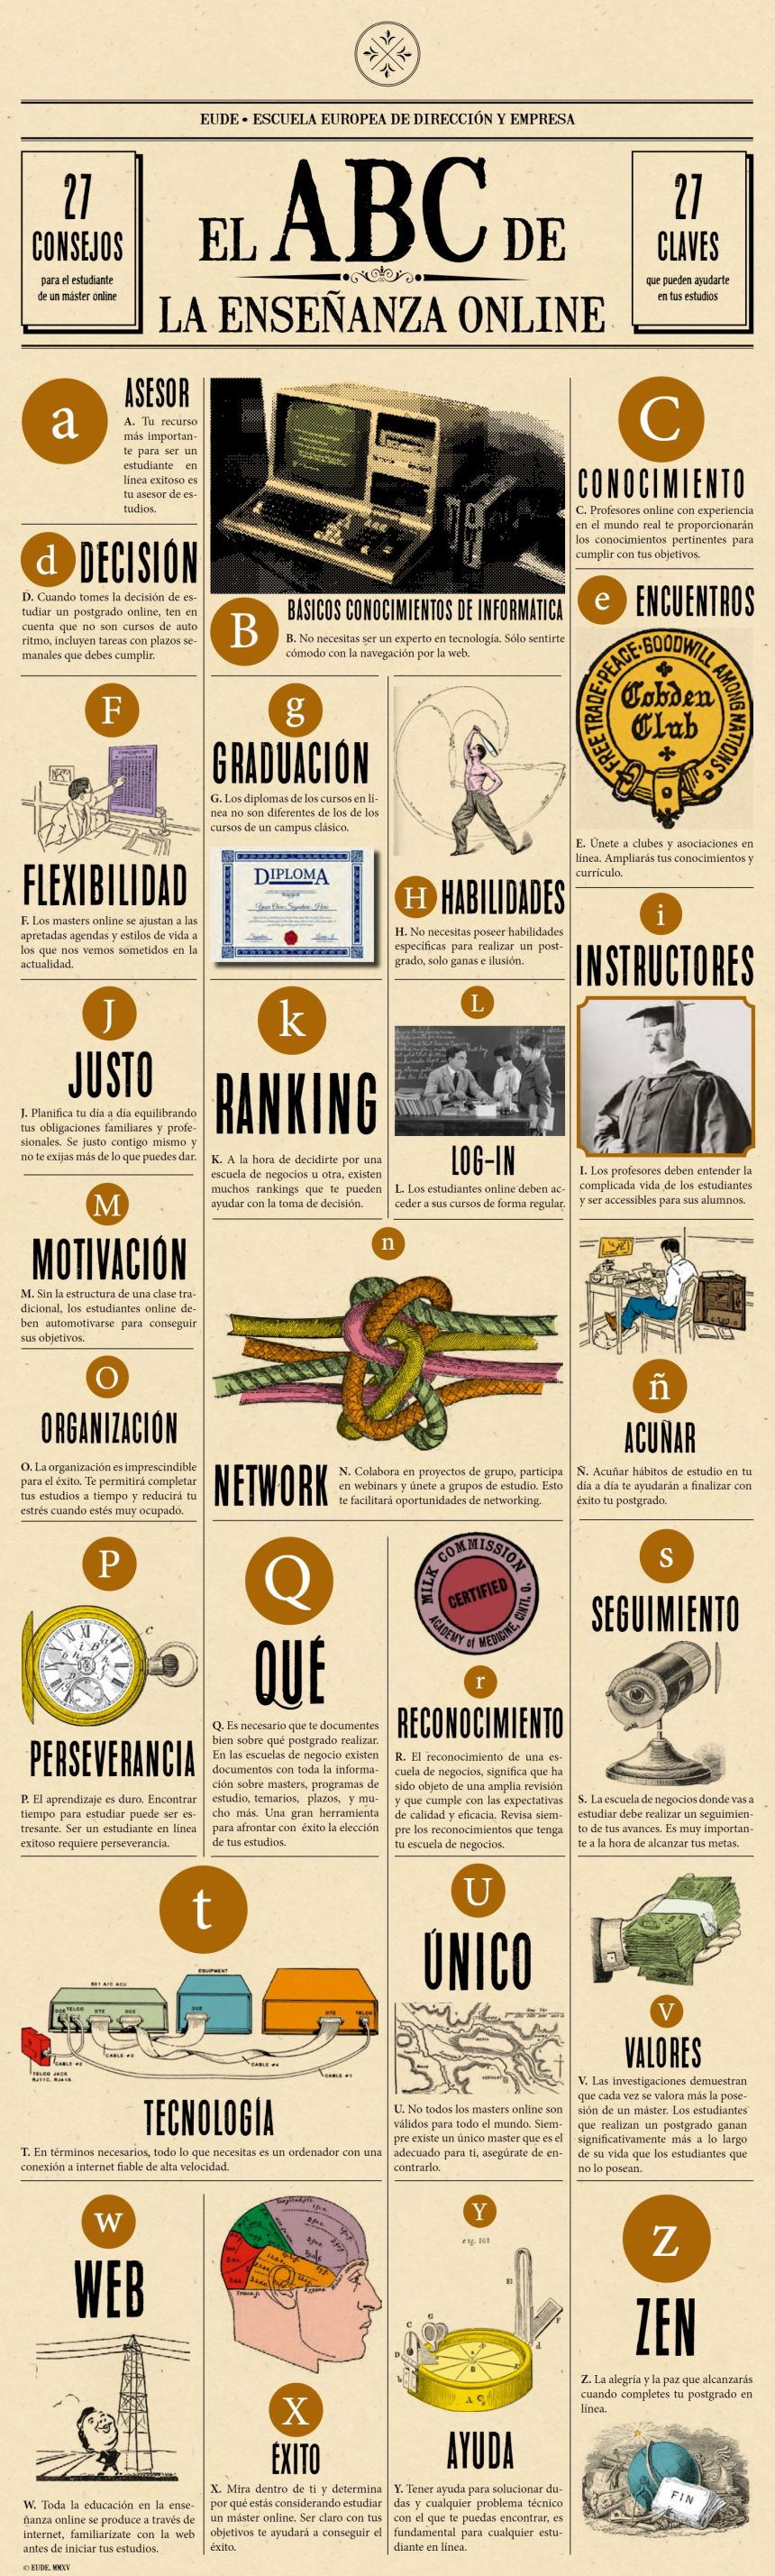 ABC de la Enseñanza Online #infografia #infographic #education